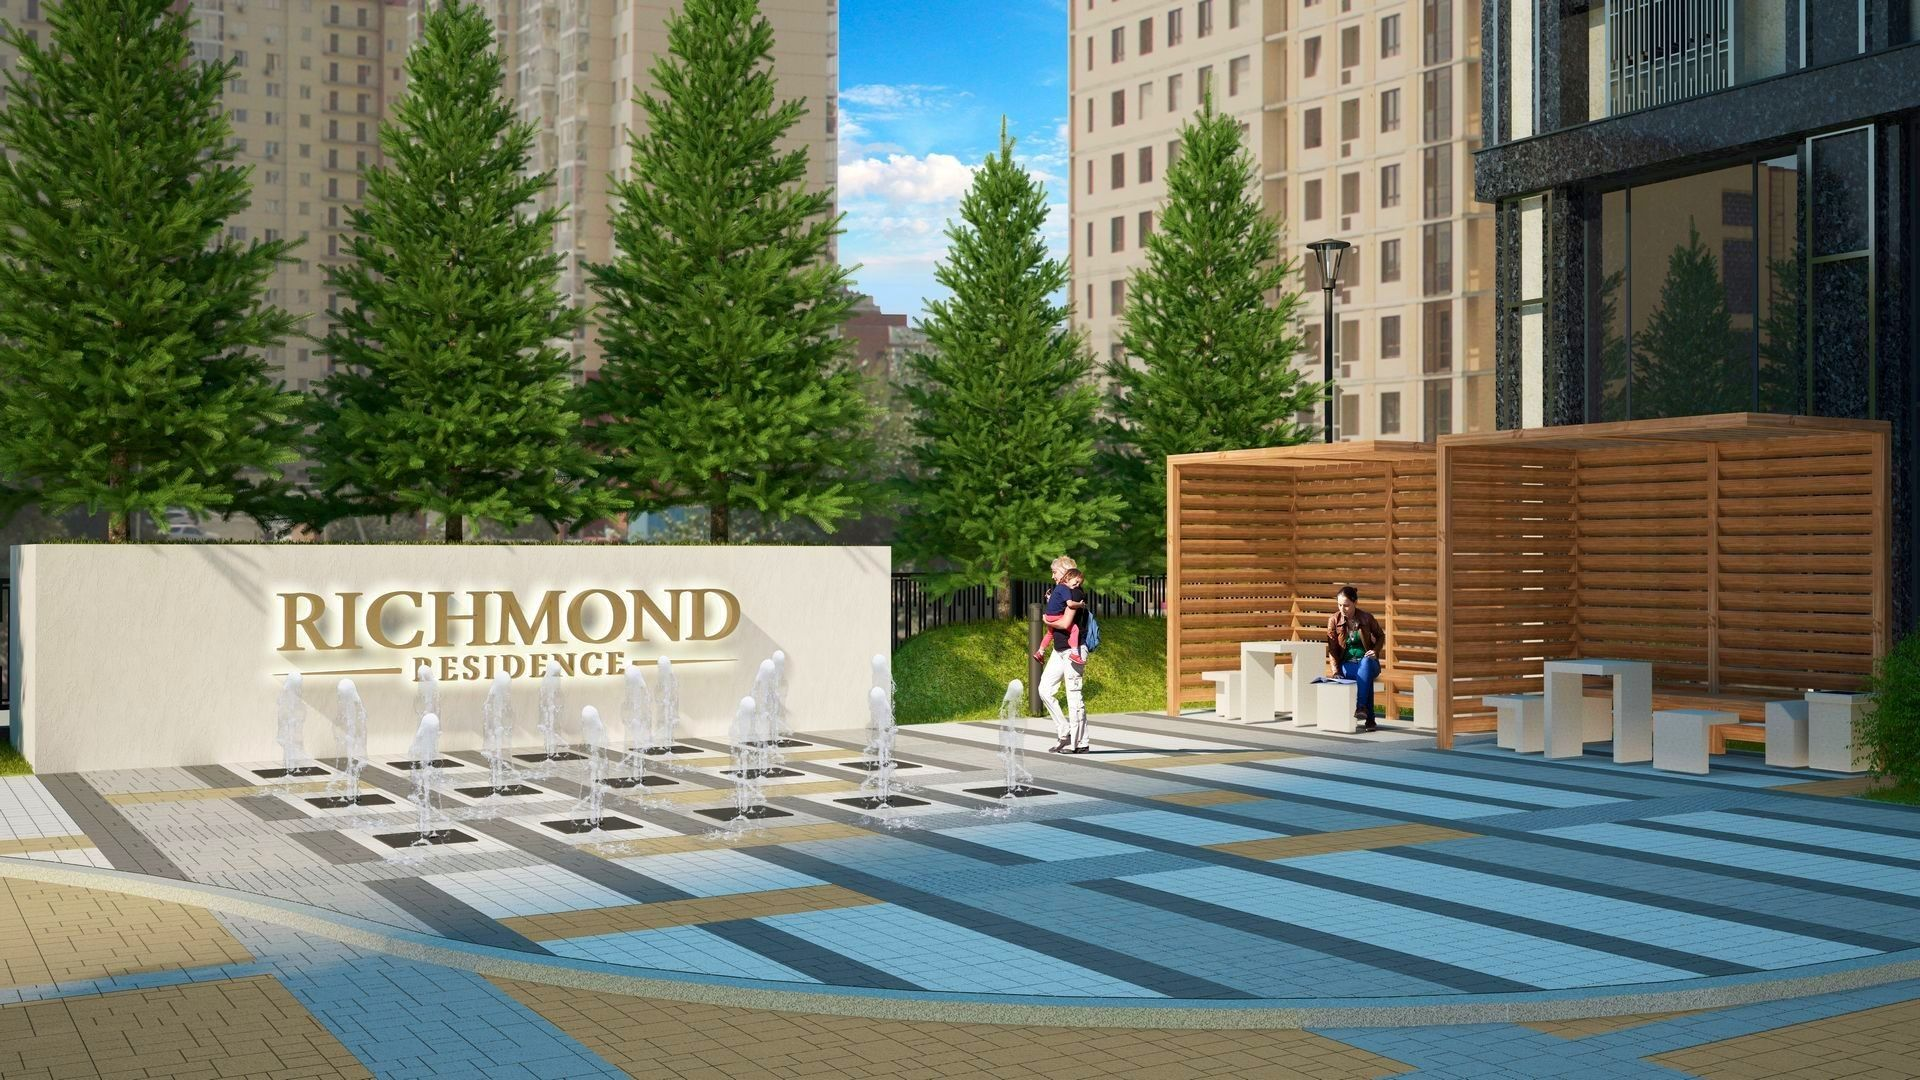 продажа квартир Richmond Residence (Ричмонд Резиденс)